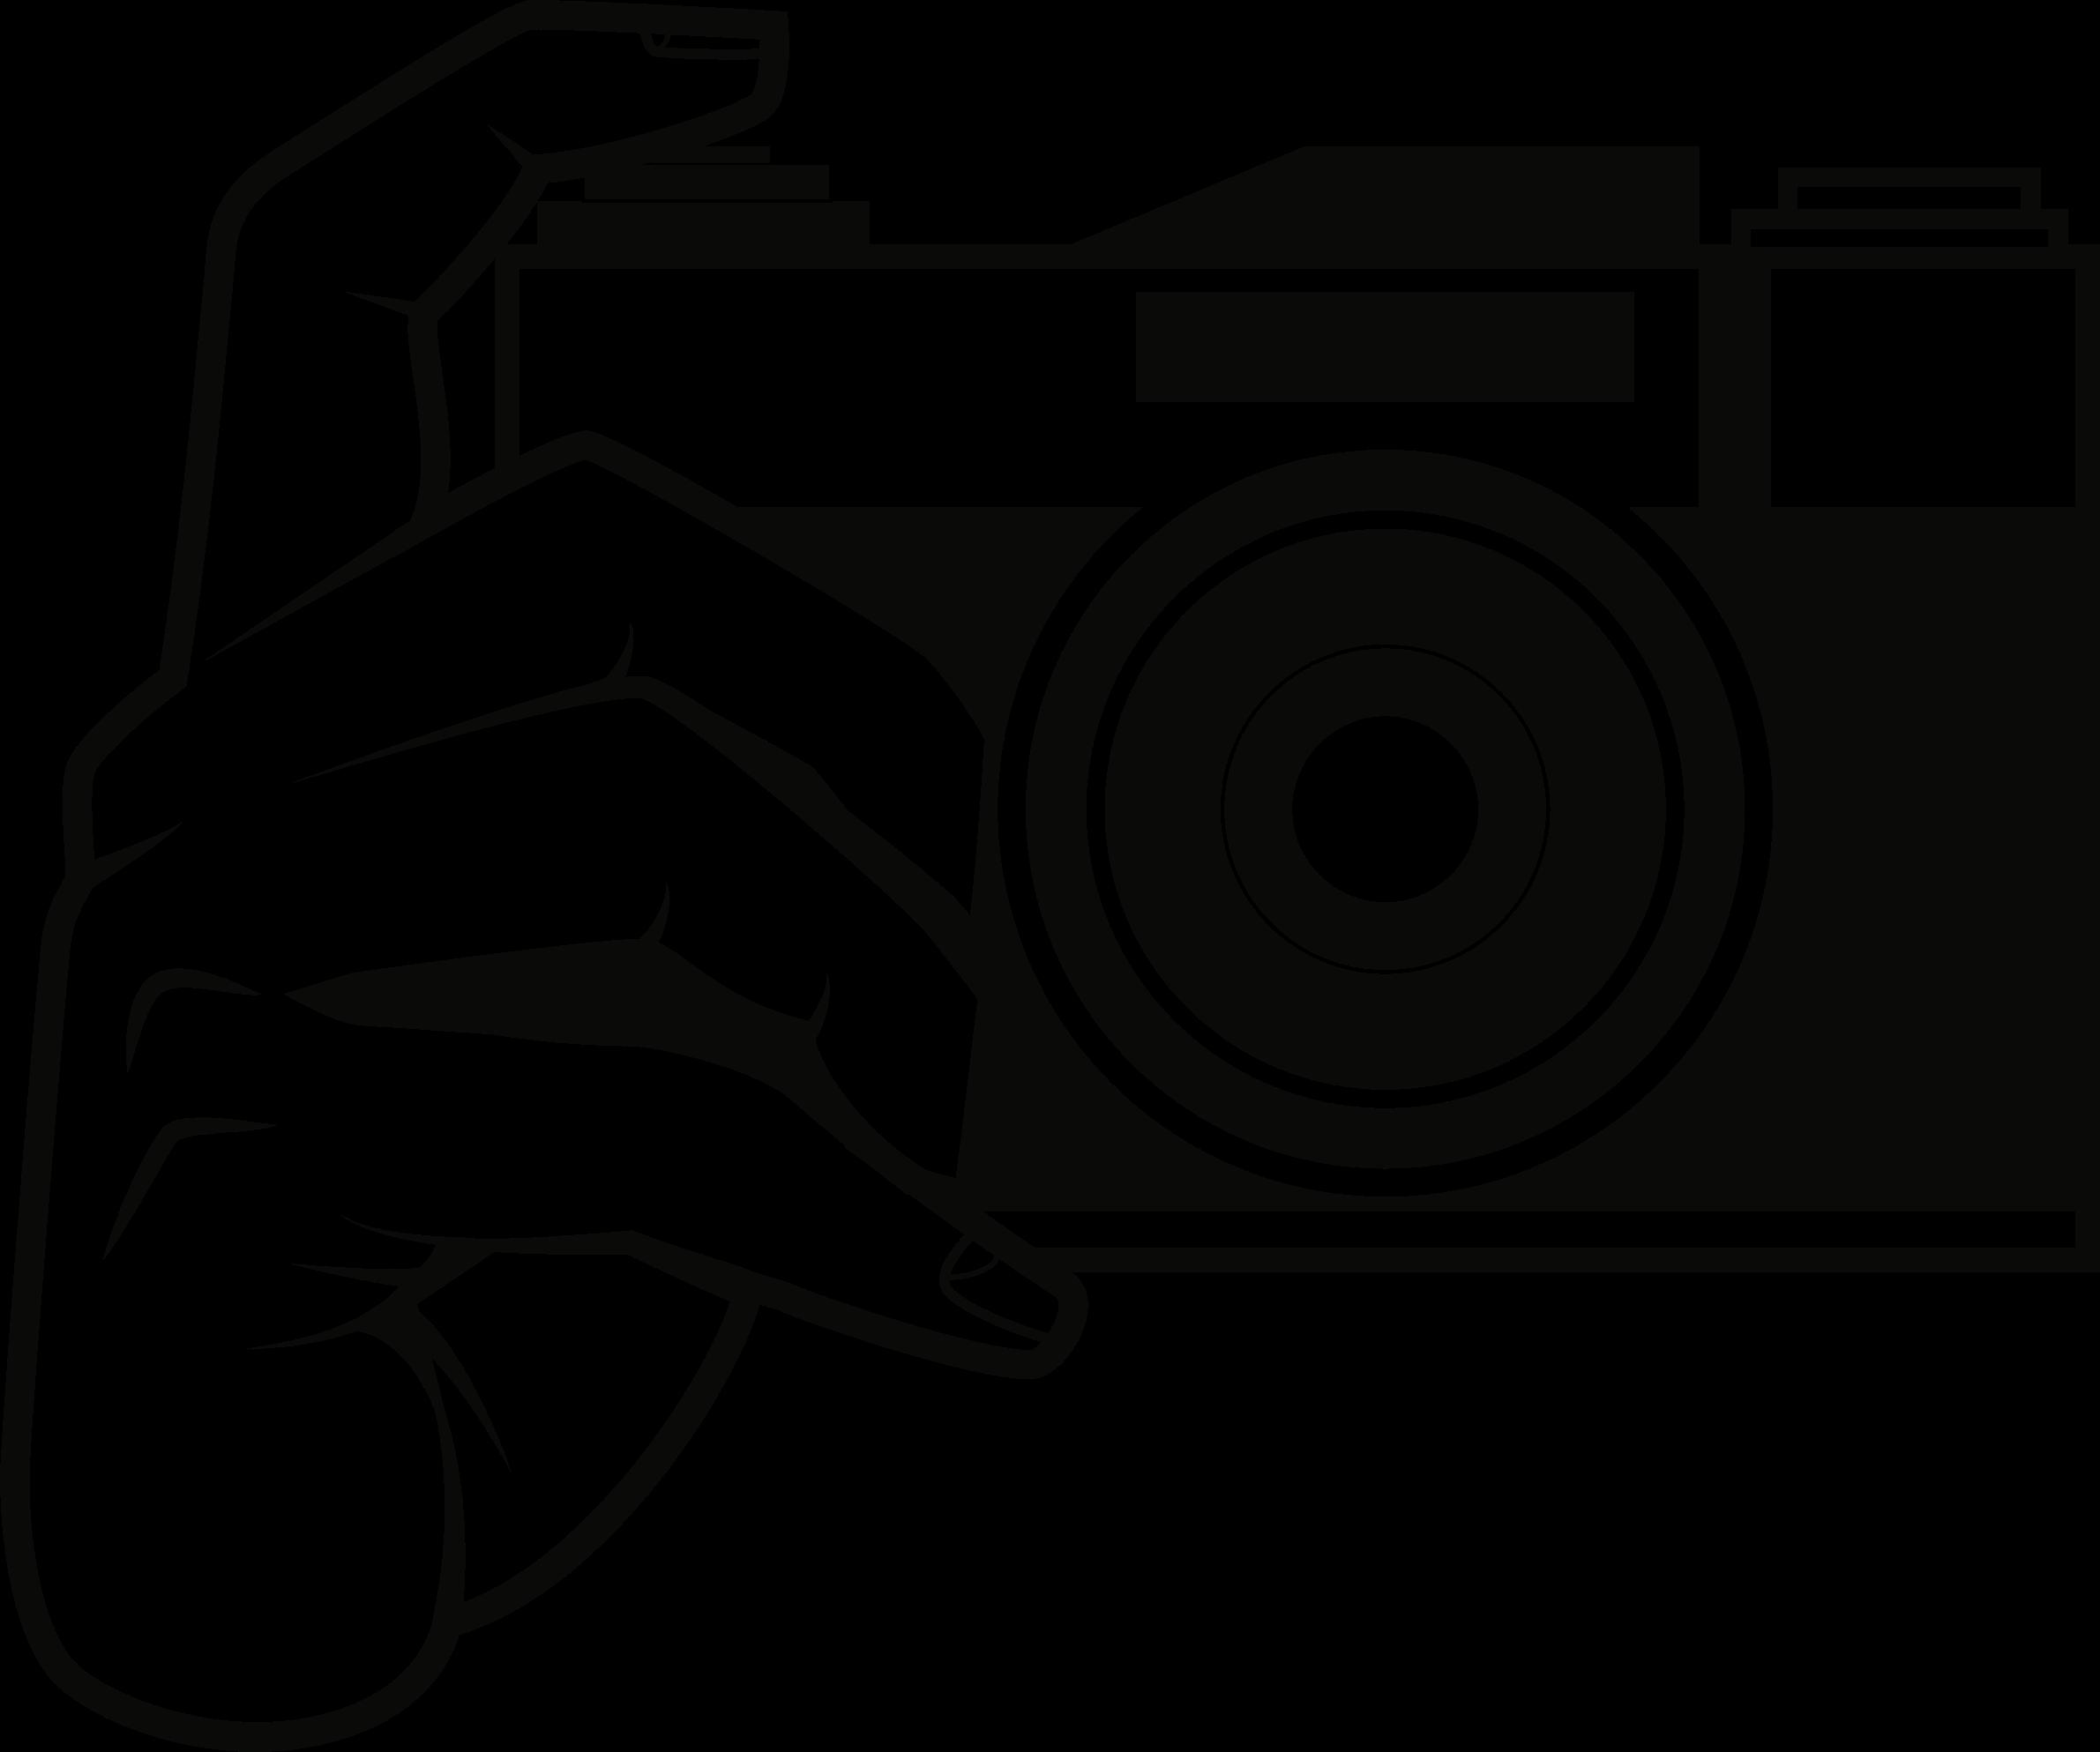 Big image png. Camera clipart camera phone